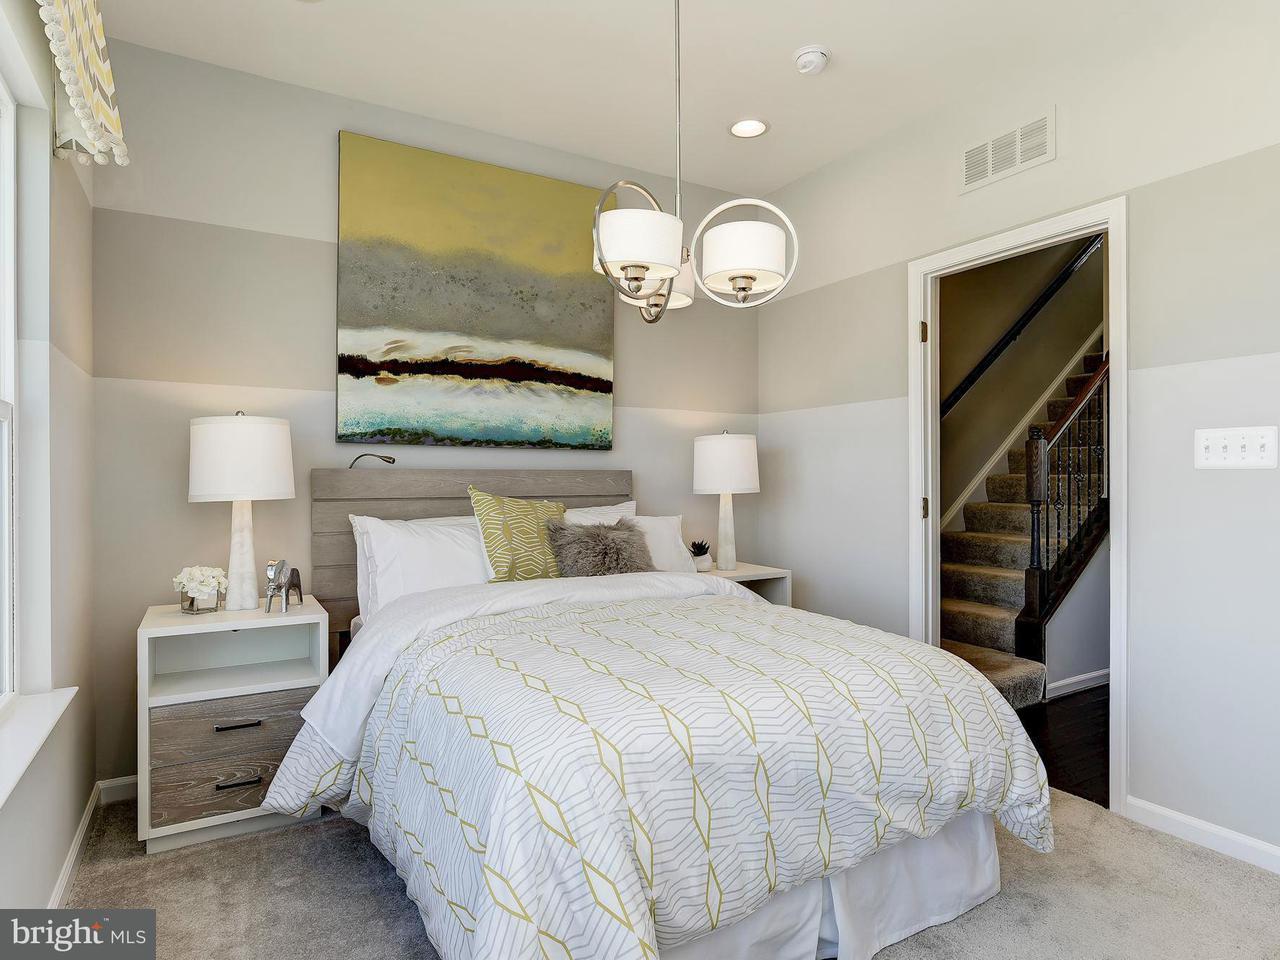 Additional photo for property listing at 3619 JAMISON ST NE 3619 JAMISON ST NE Washington, Distrito De Columbia 20018 Estados Unidos